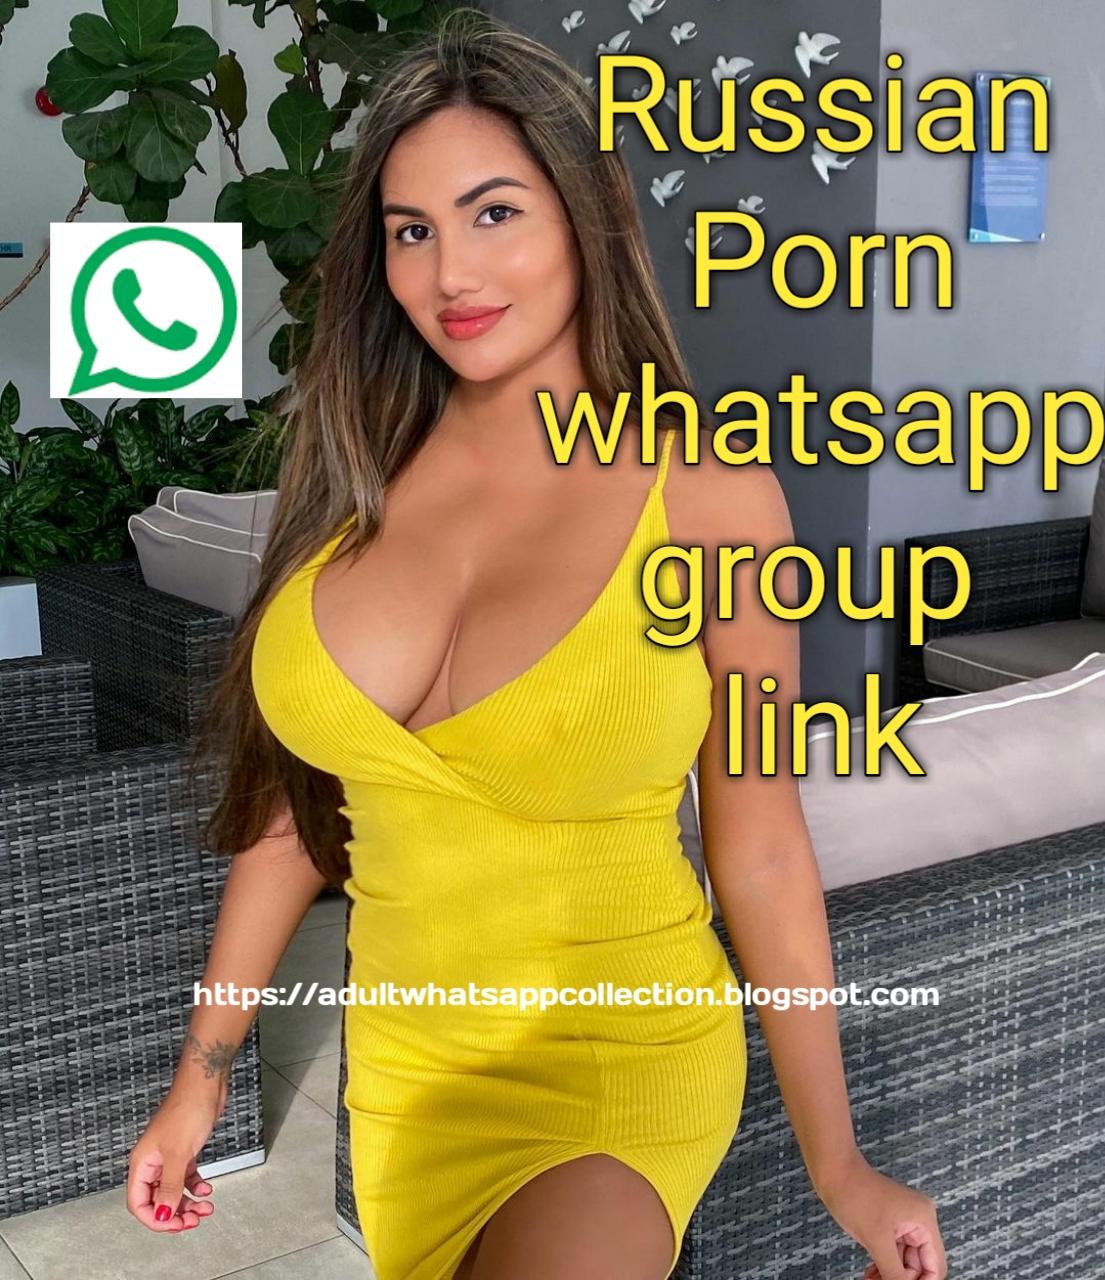 Russian Porn whatsapp group link